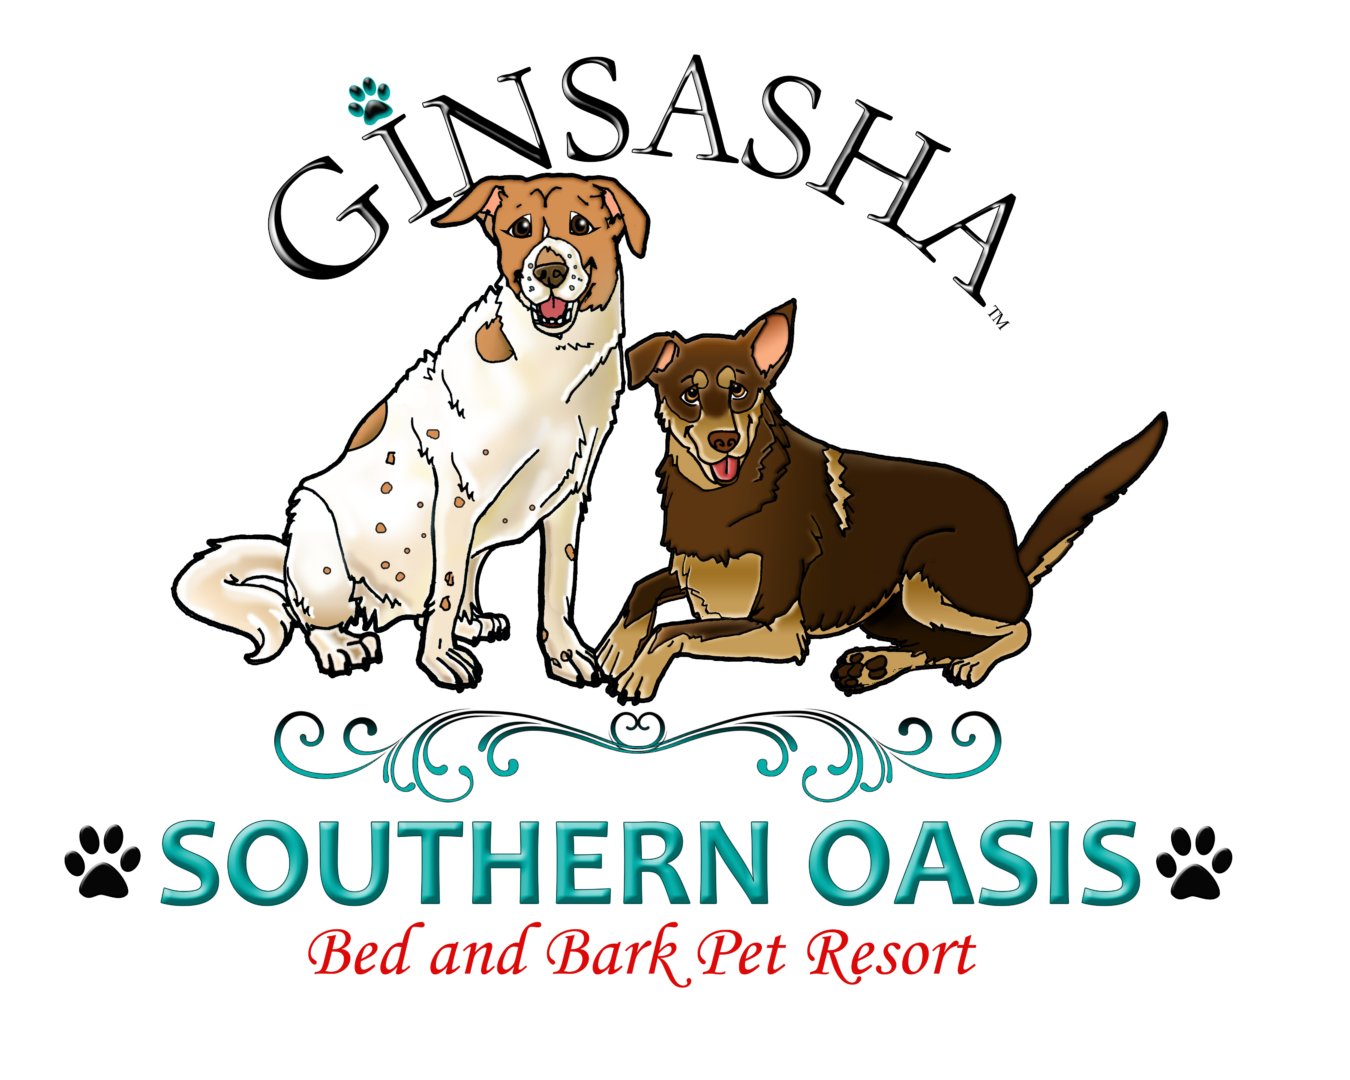 Southern Oasis Logo Spa (2)